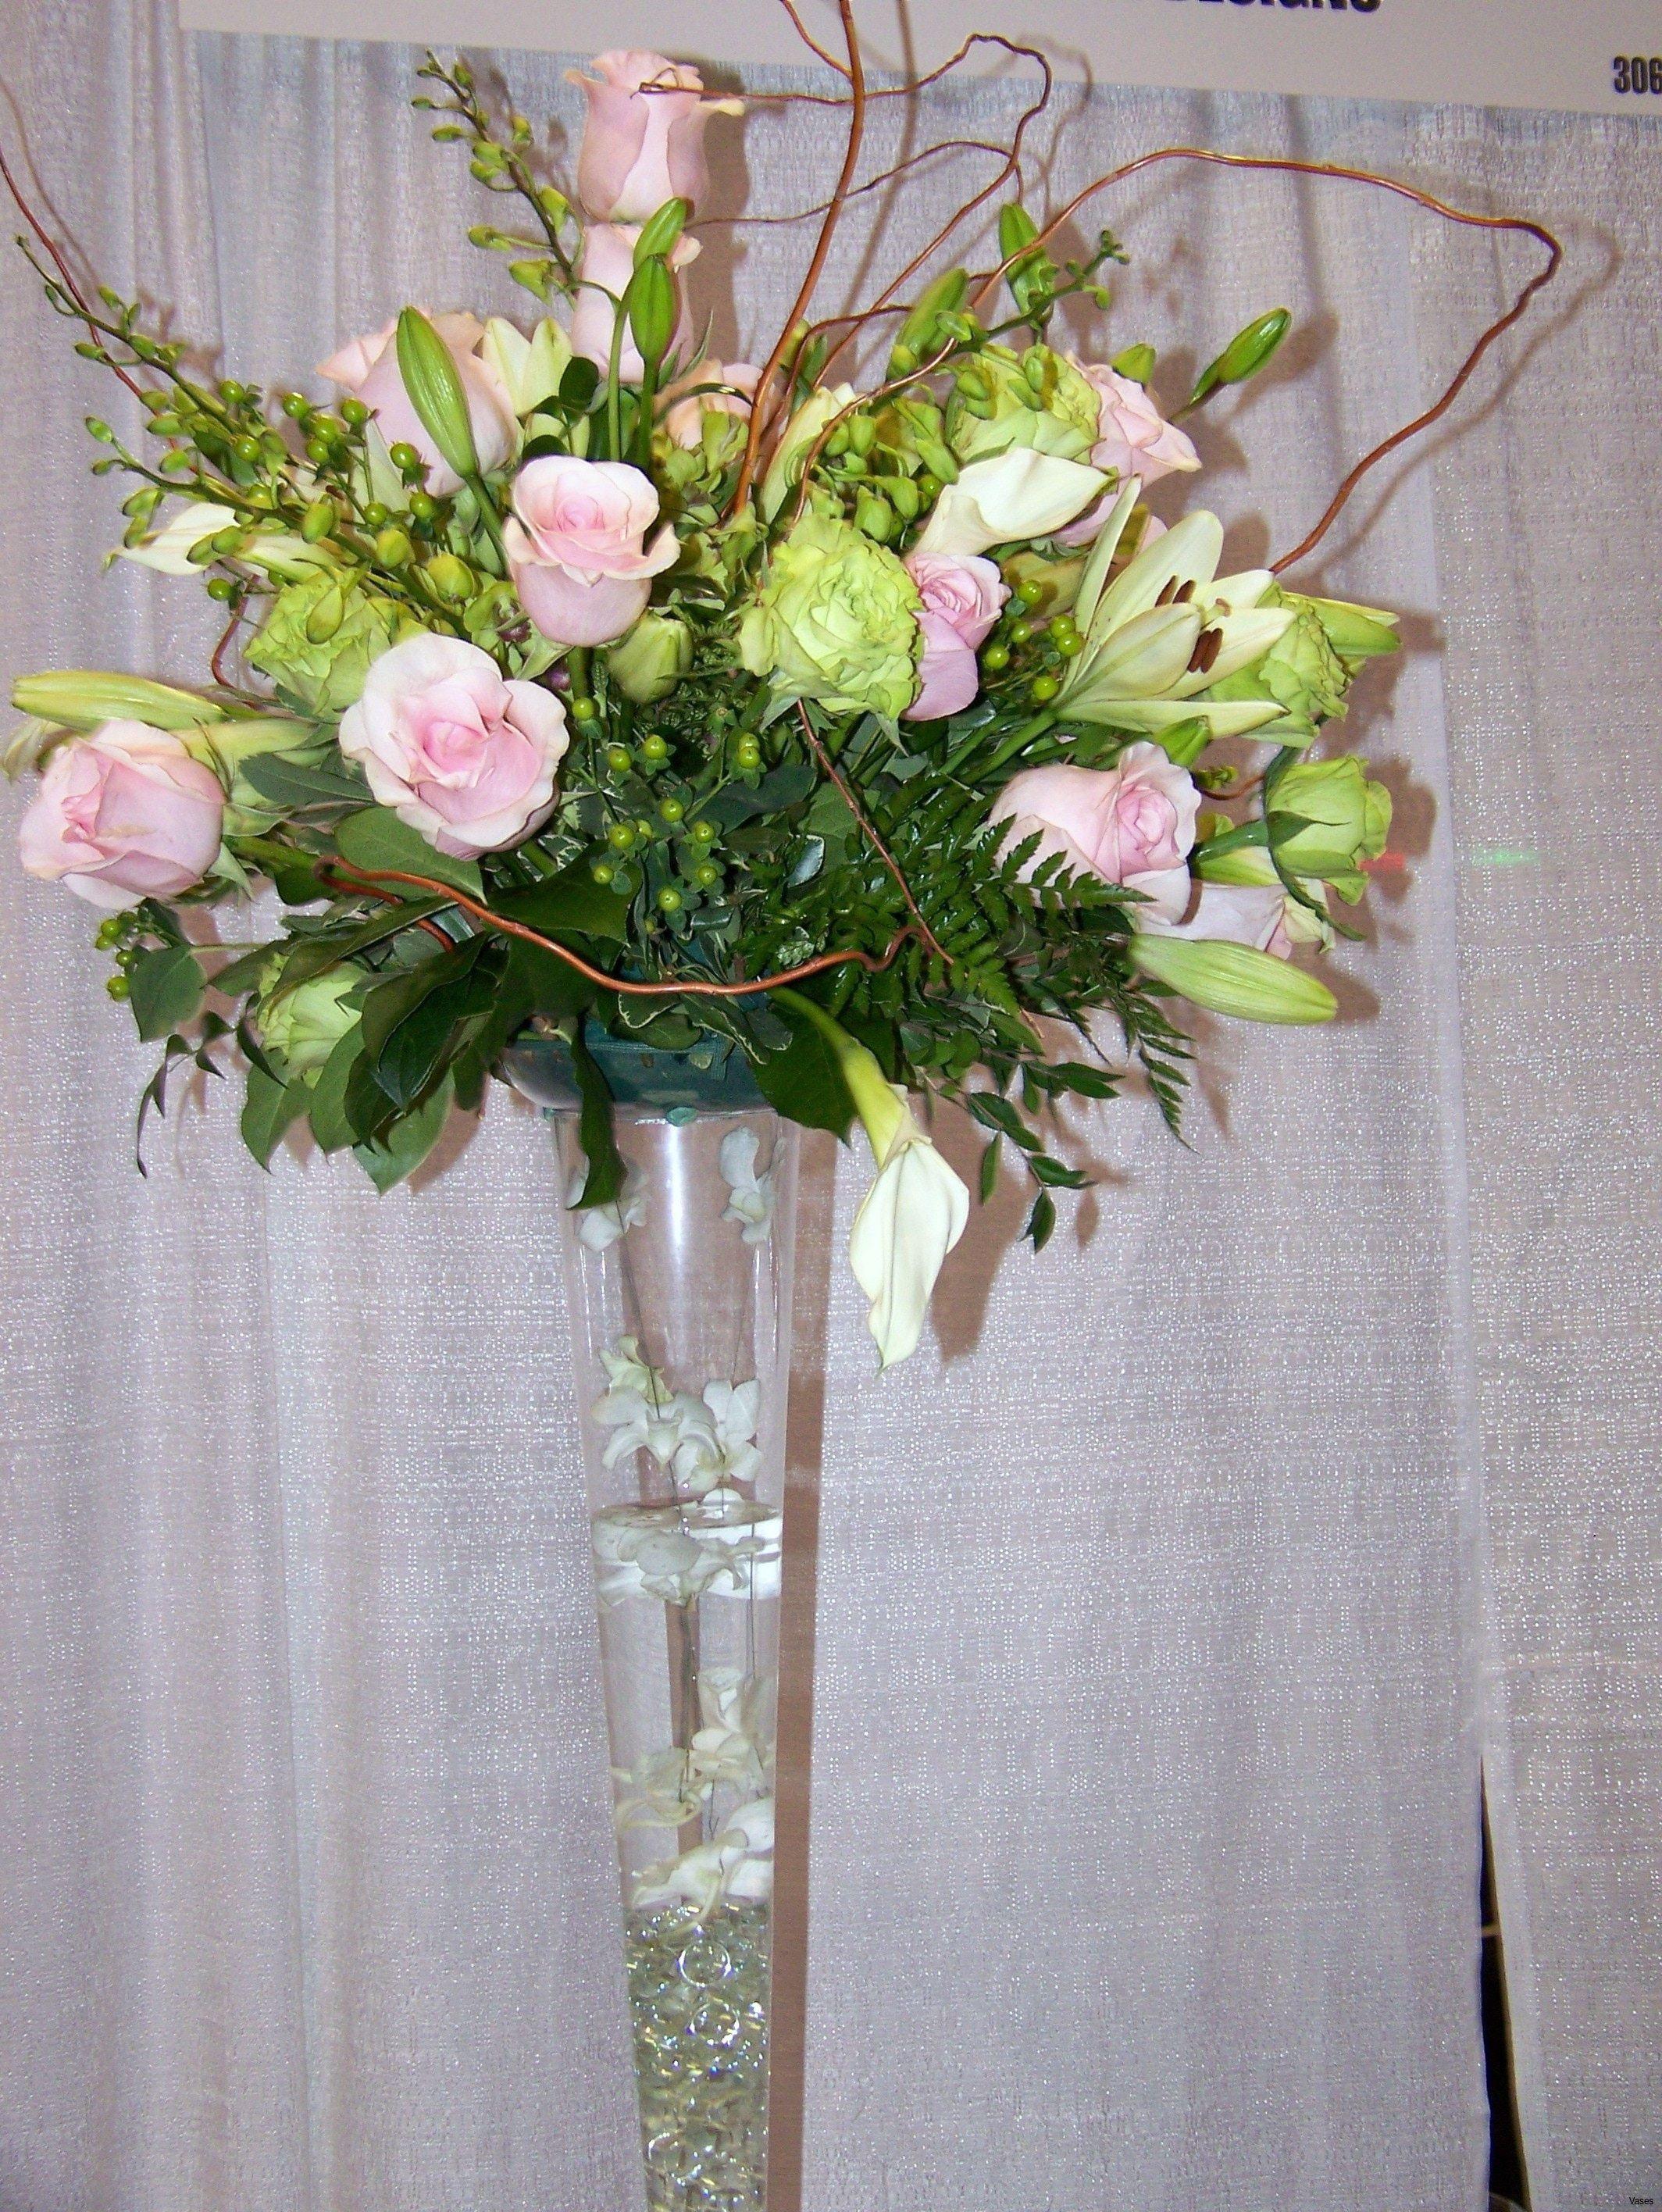 round glass vases bulk of 22 hobnail glass vase the weekly world for h vases ideas for floral arrangements in i 0d design ideas design